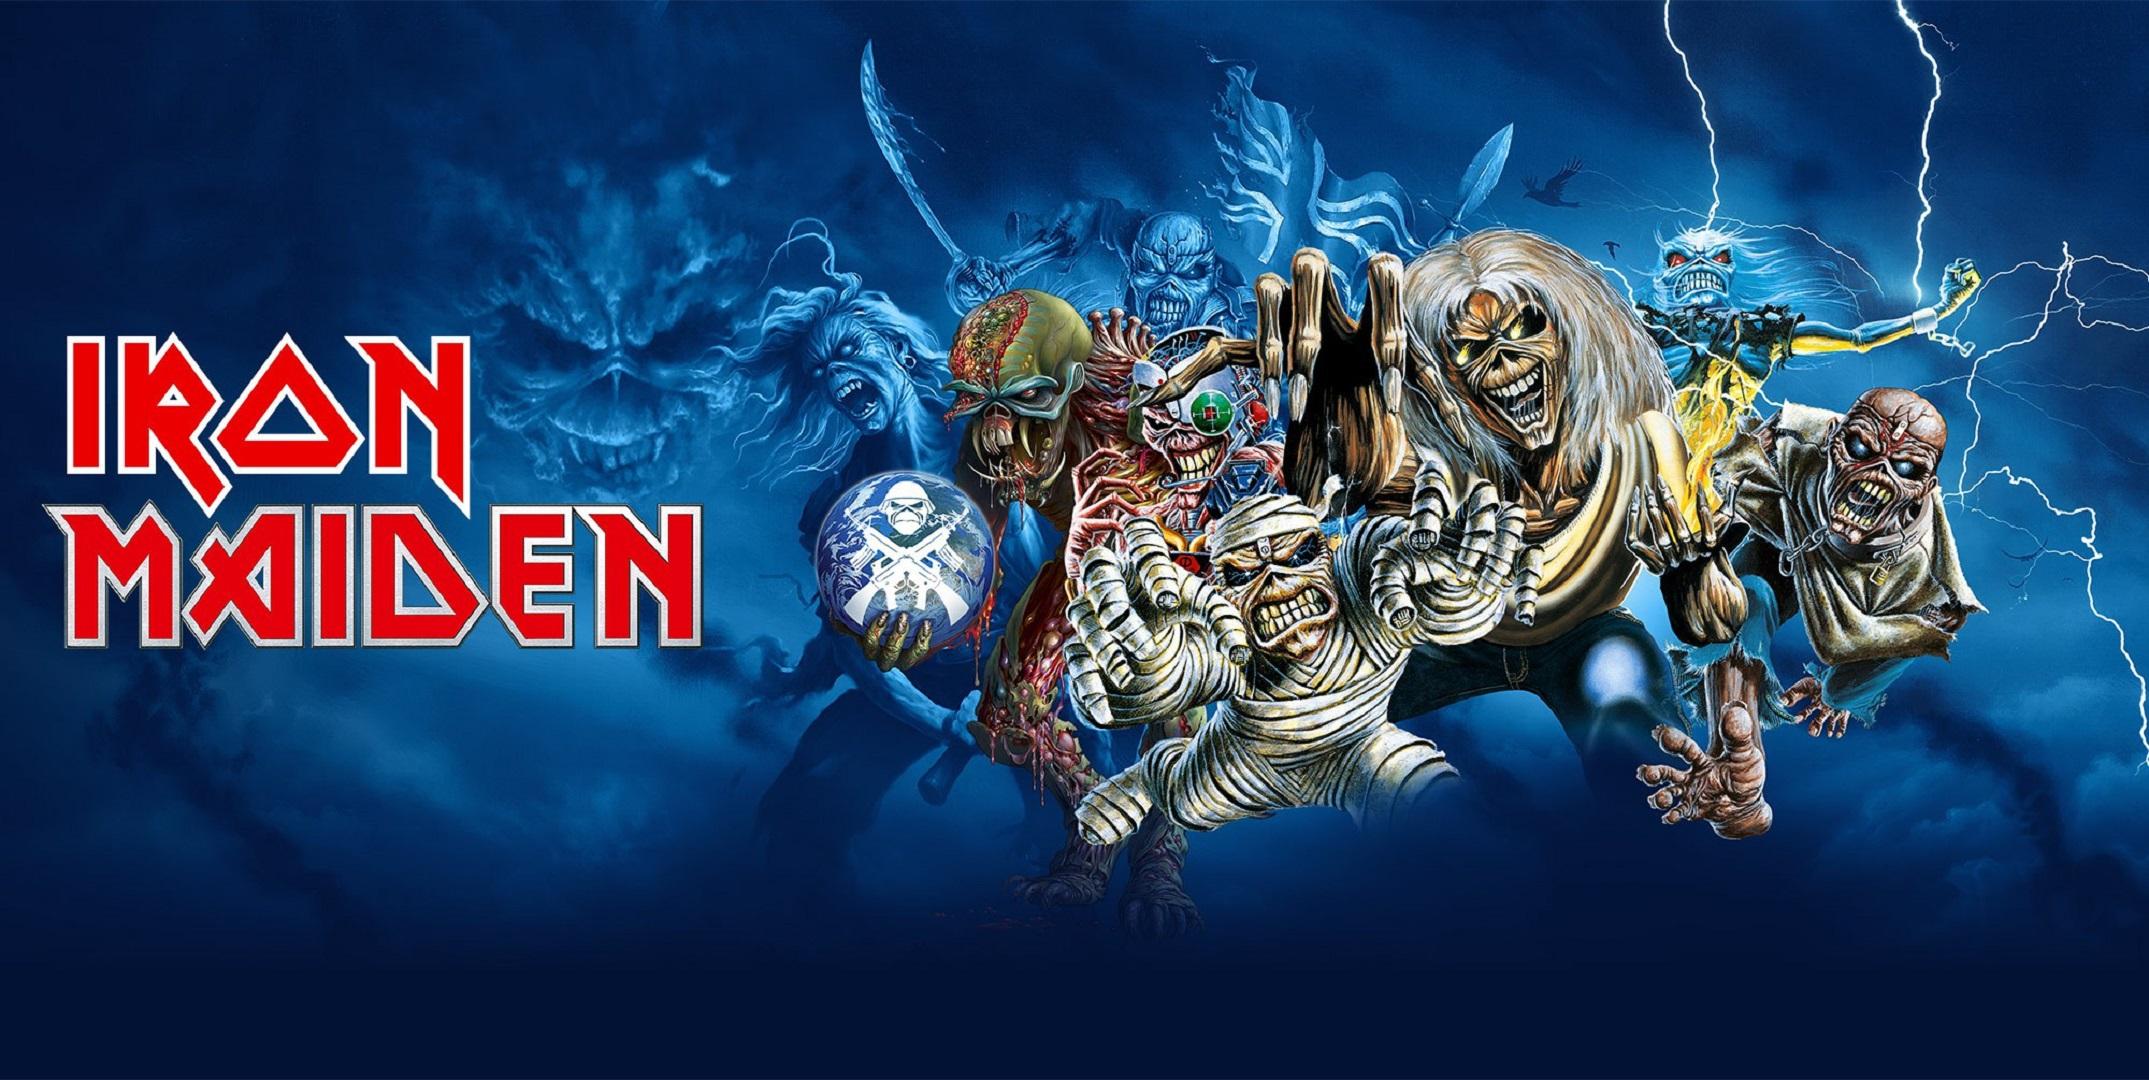 Iron Maiden Desktop Wallpaper: Iron Maiden Wallpapers Images Photos Pictures Backgrounds